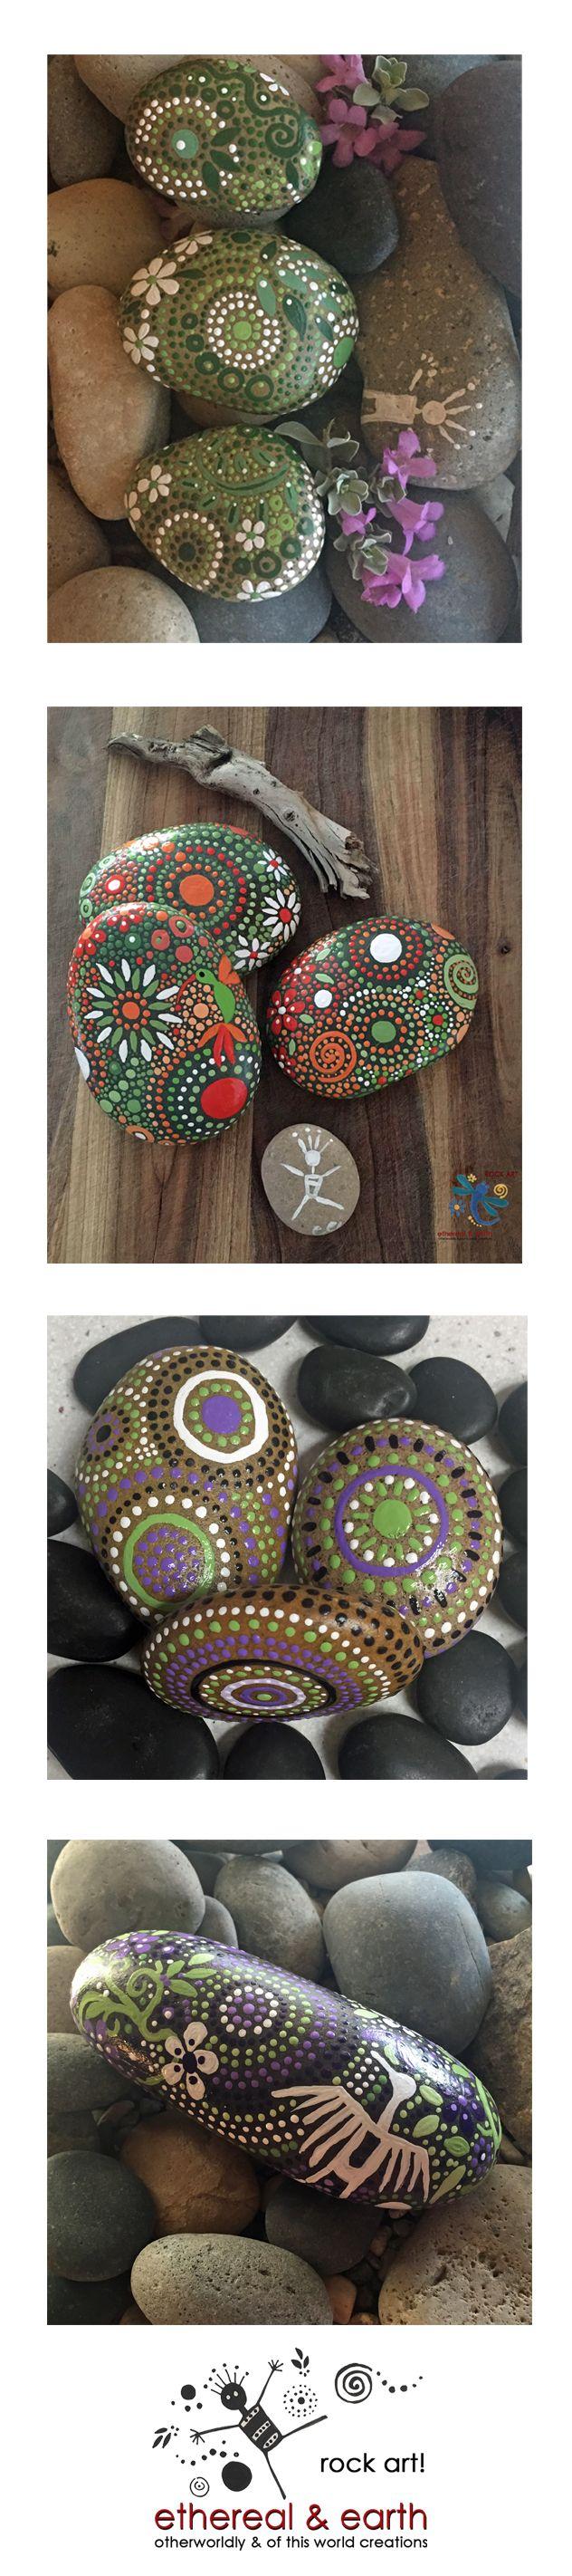 Green Hand Painted Stones - Natural Home Decor - Mandala Inspired Designs - Tribal Art - Rock Art - Garden Art - Free US Shipping - ethereal & earth